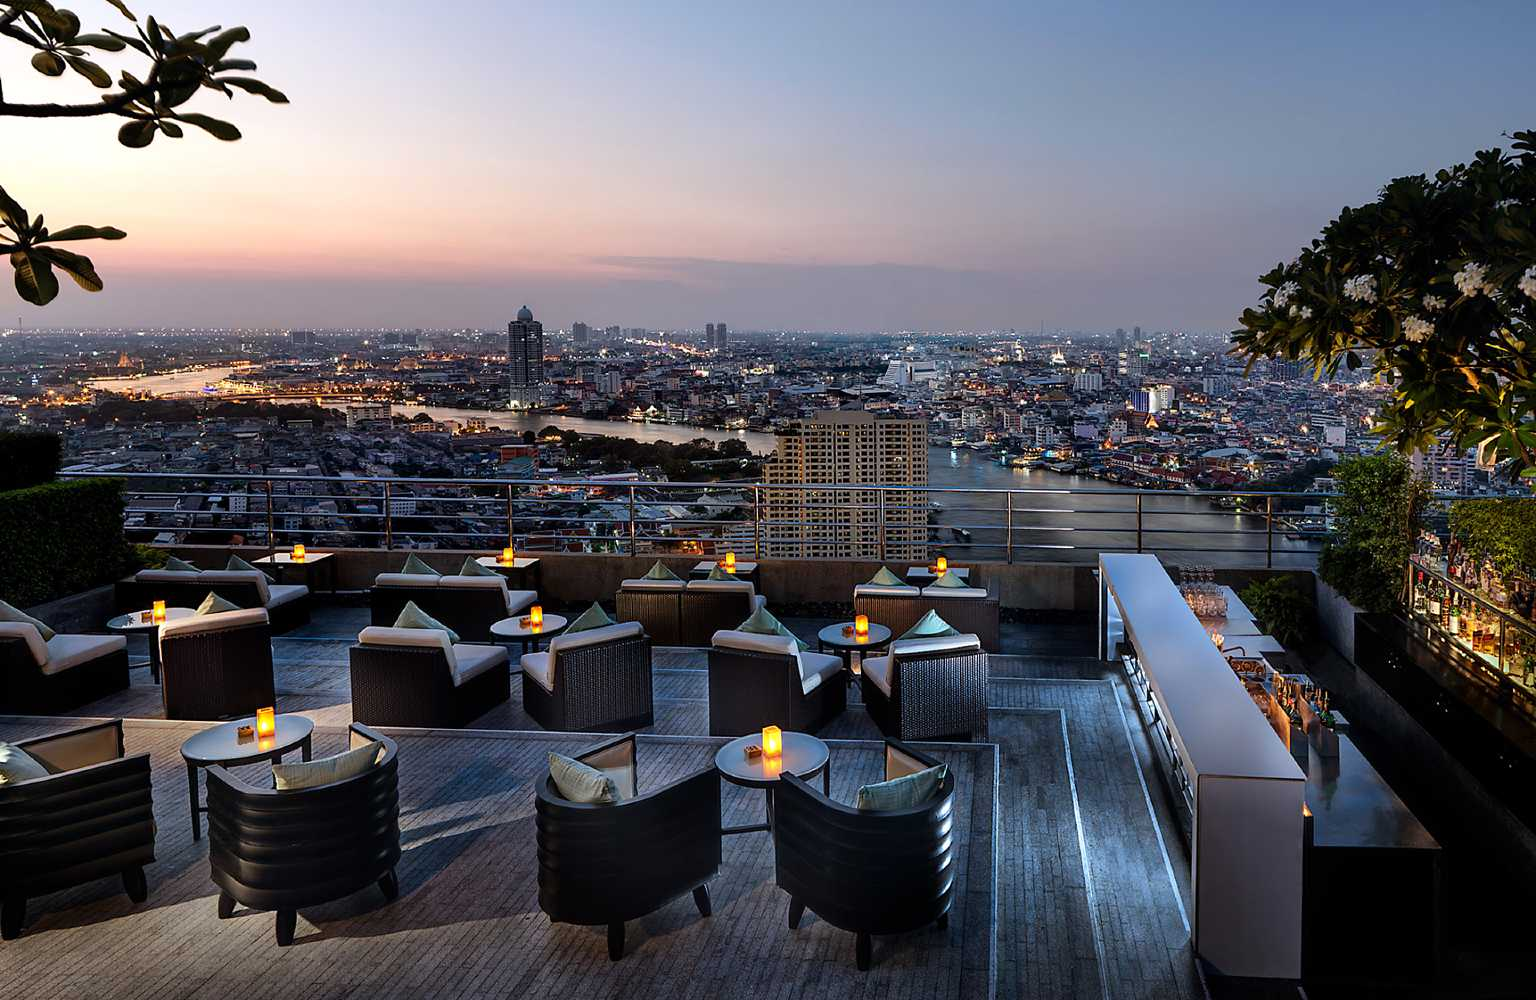 Millennium Hilton Bangkok - lounge area on sky bar overlooking the river